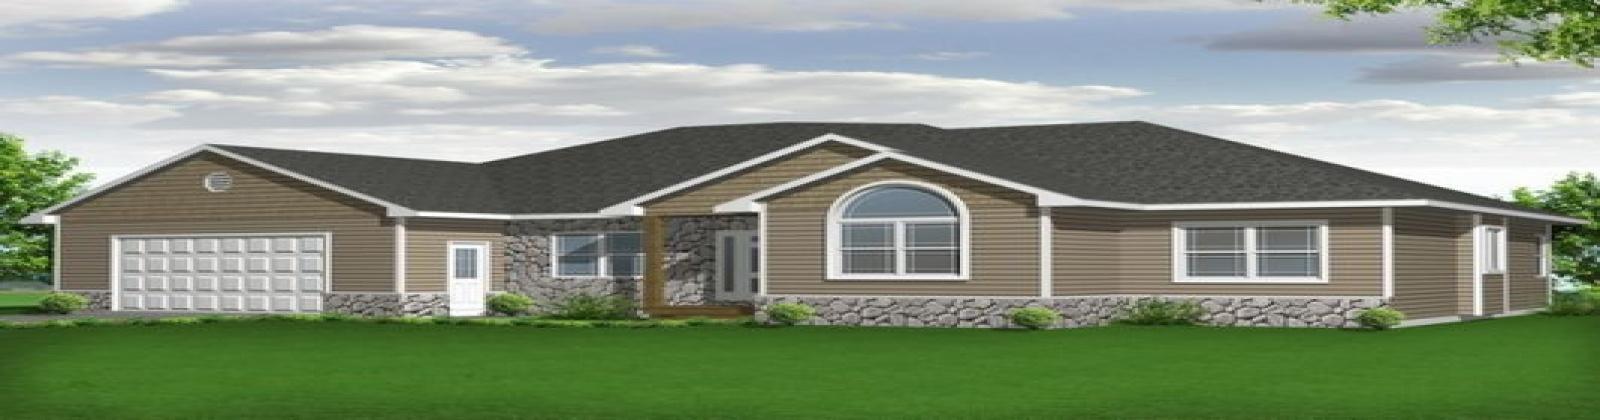 Michigan,United States,Ranch,1081